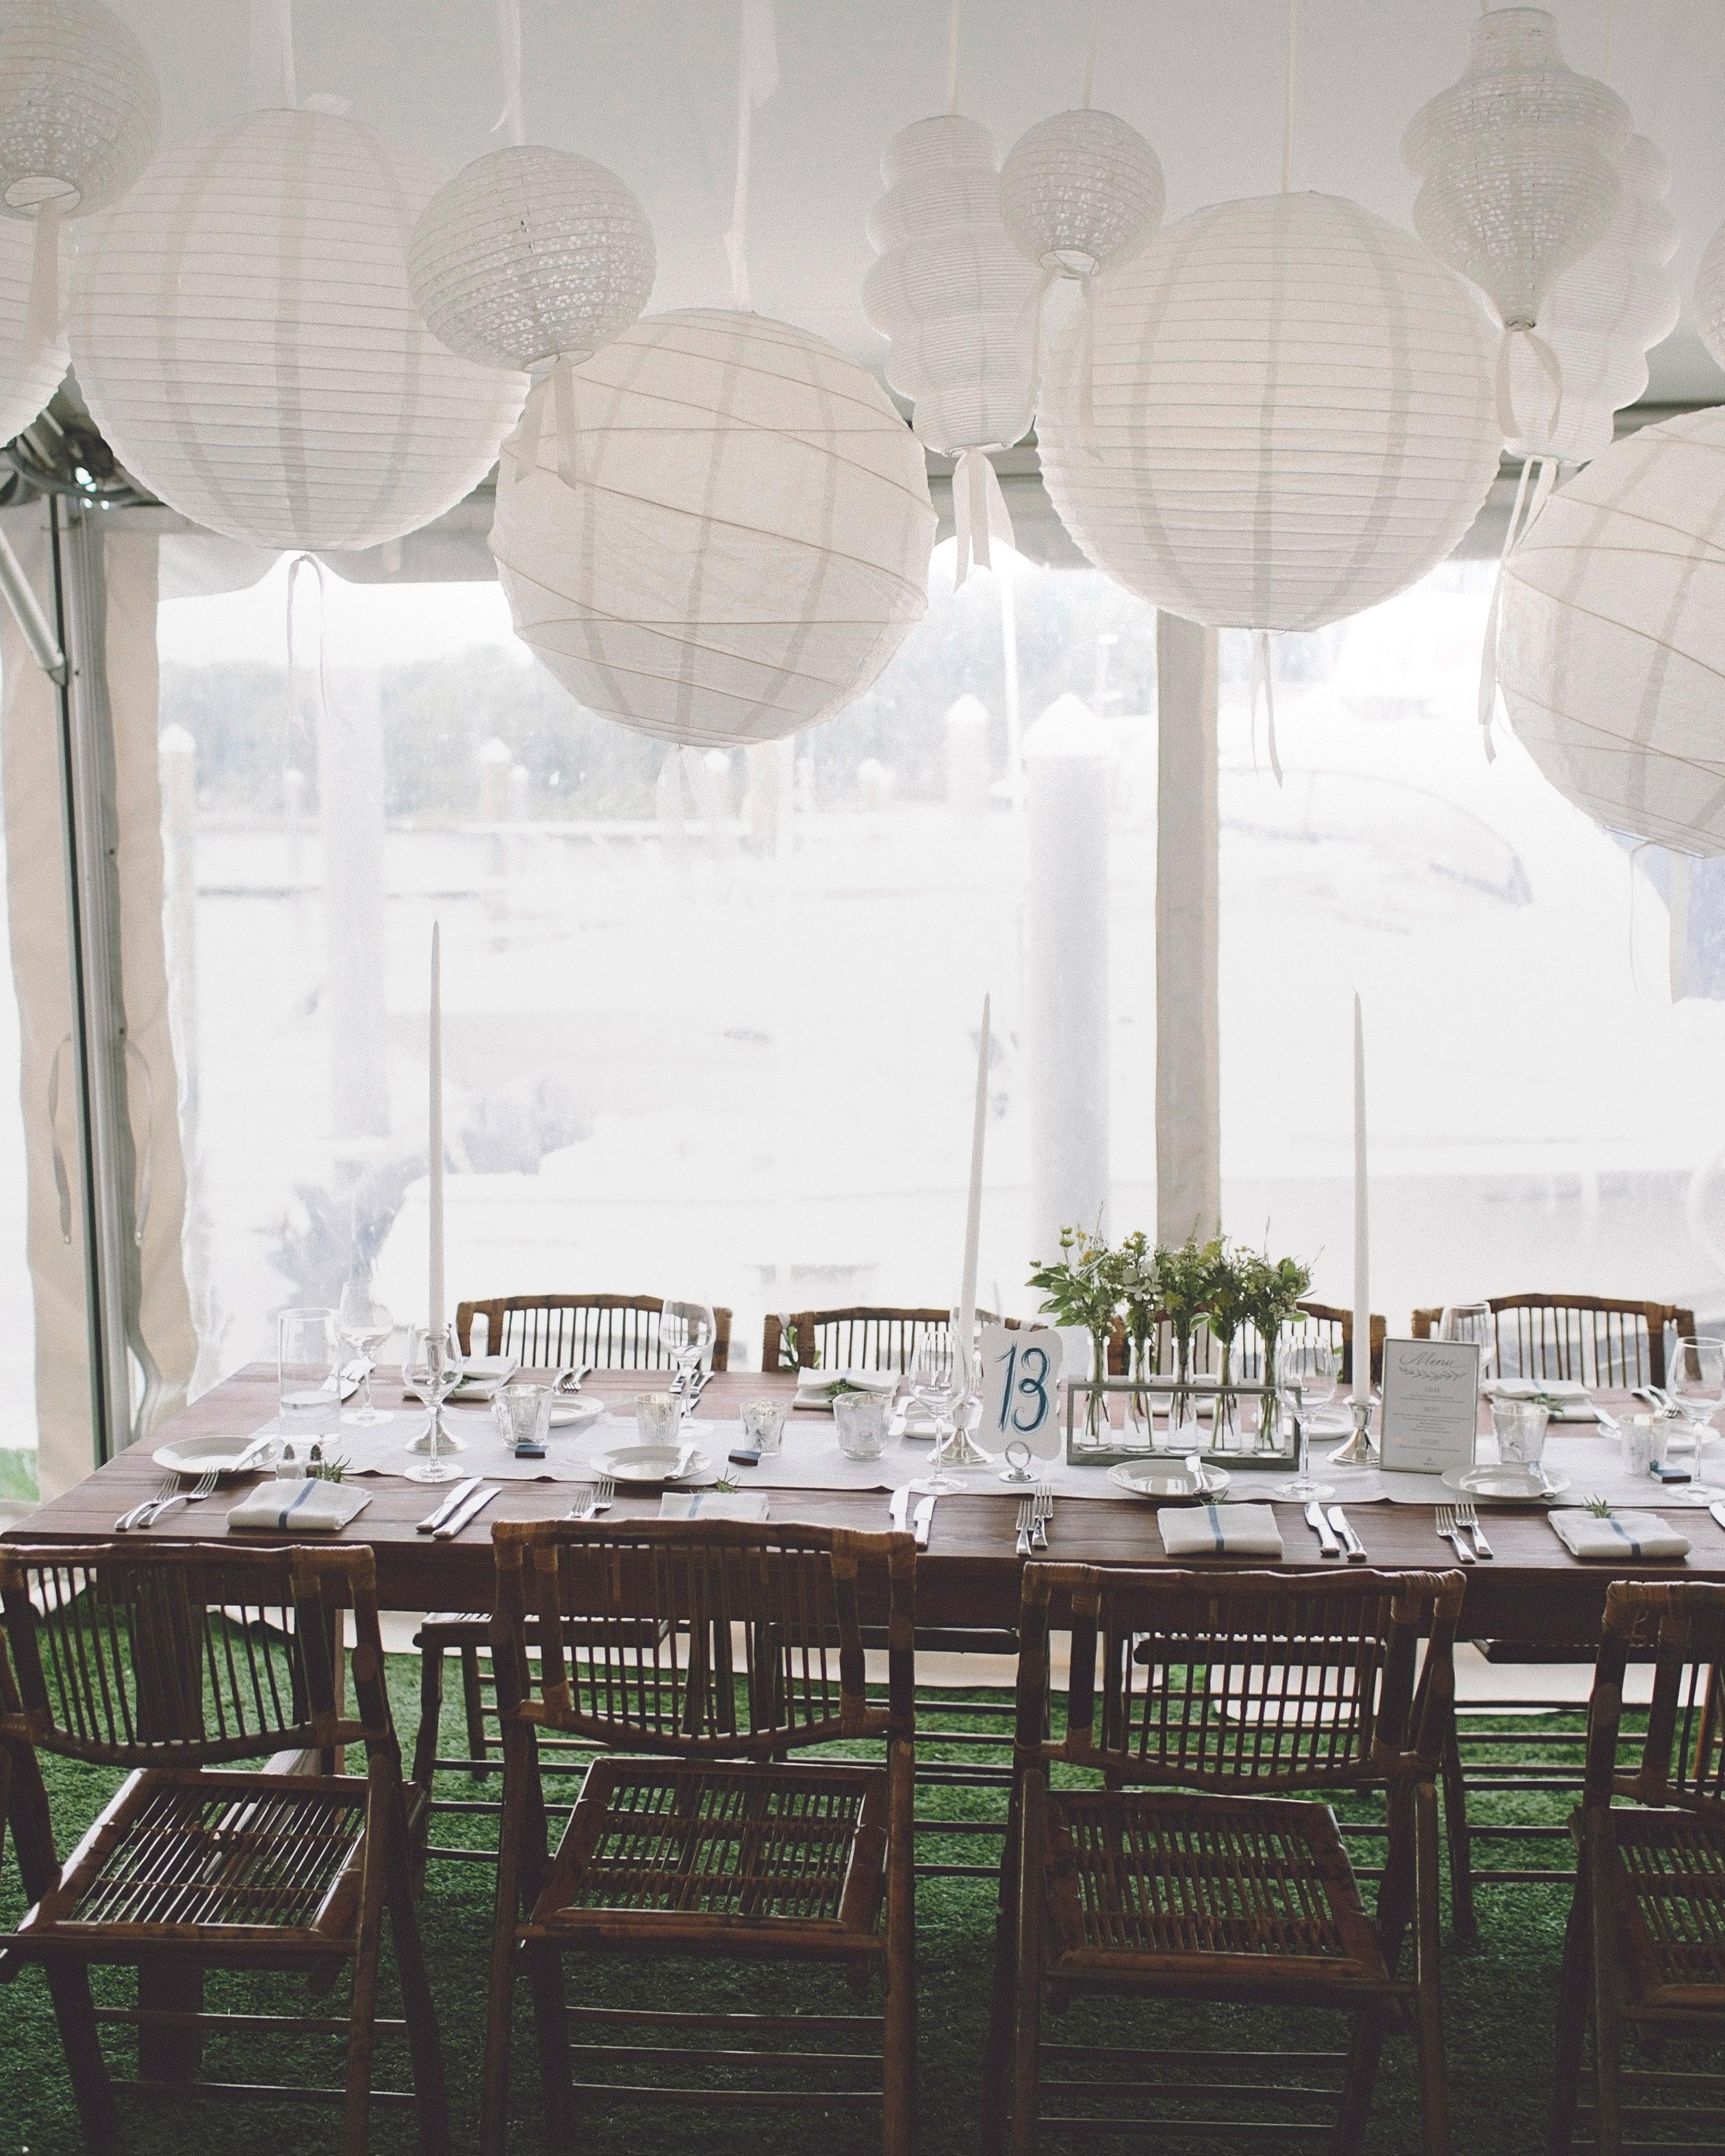 molly-greg-wedding-tent-00036-s111481-0814.jpg